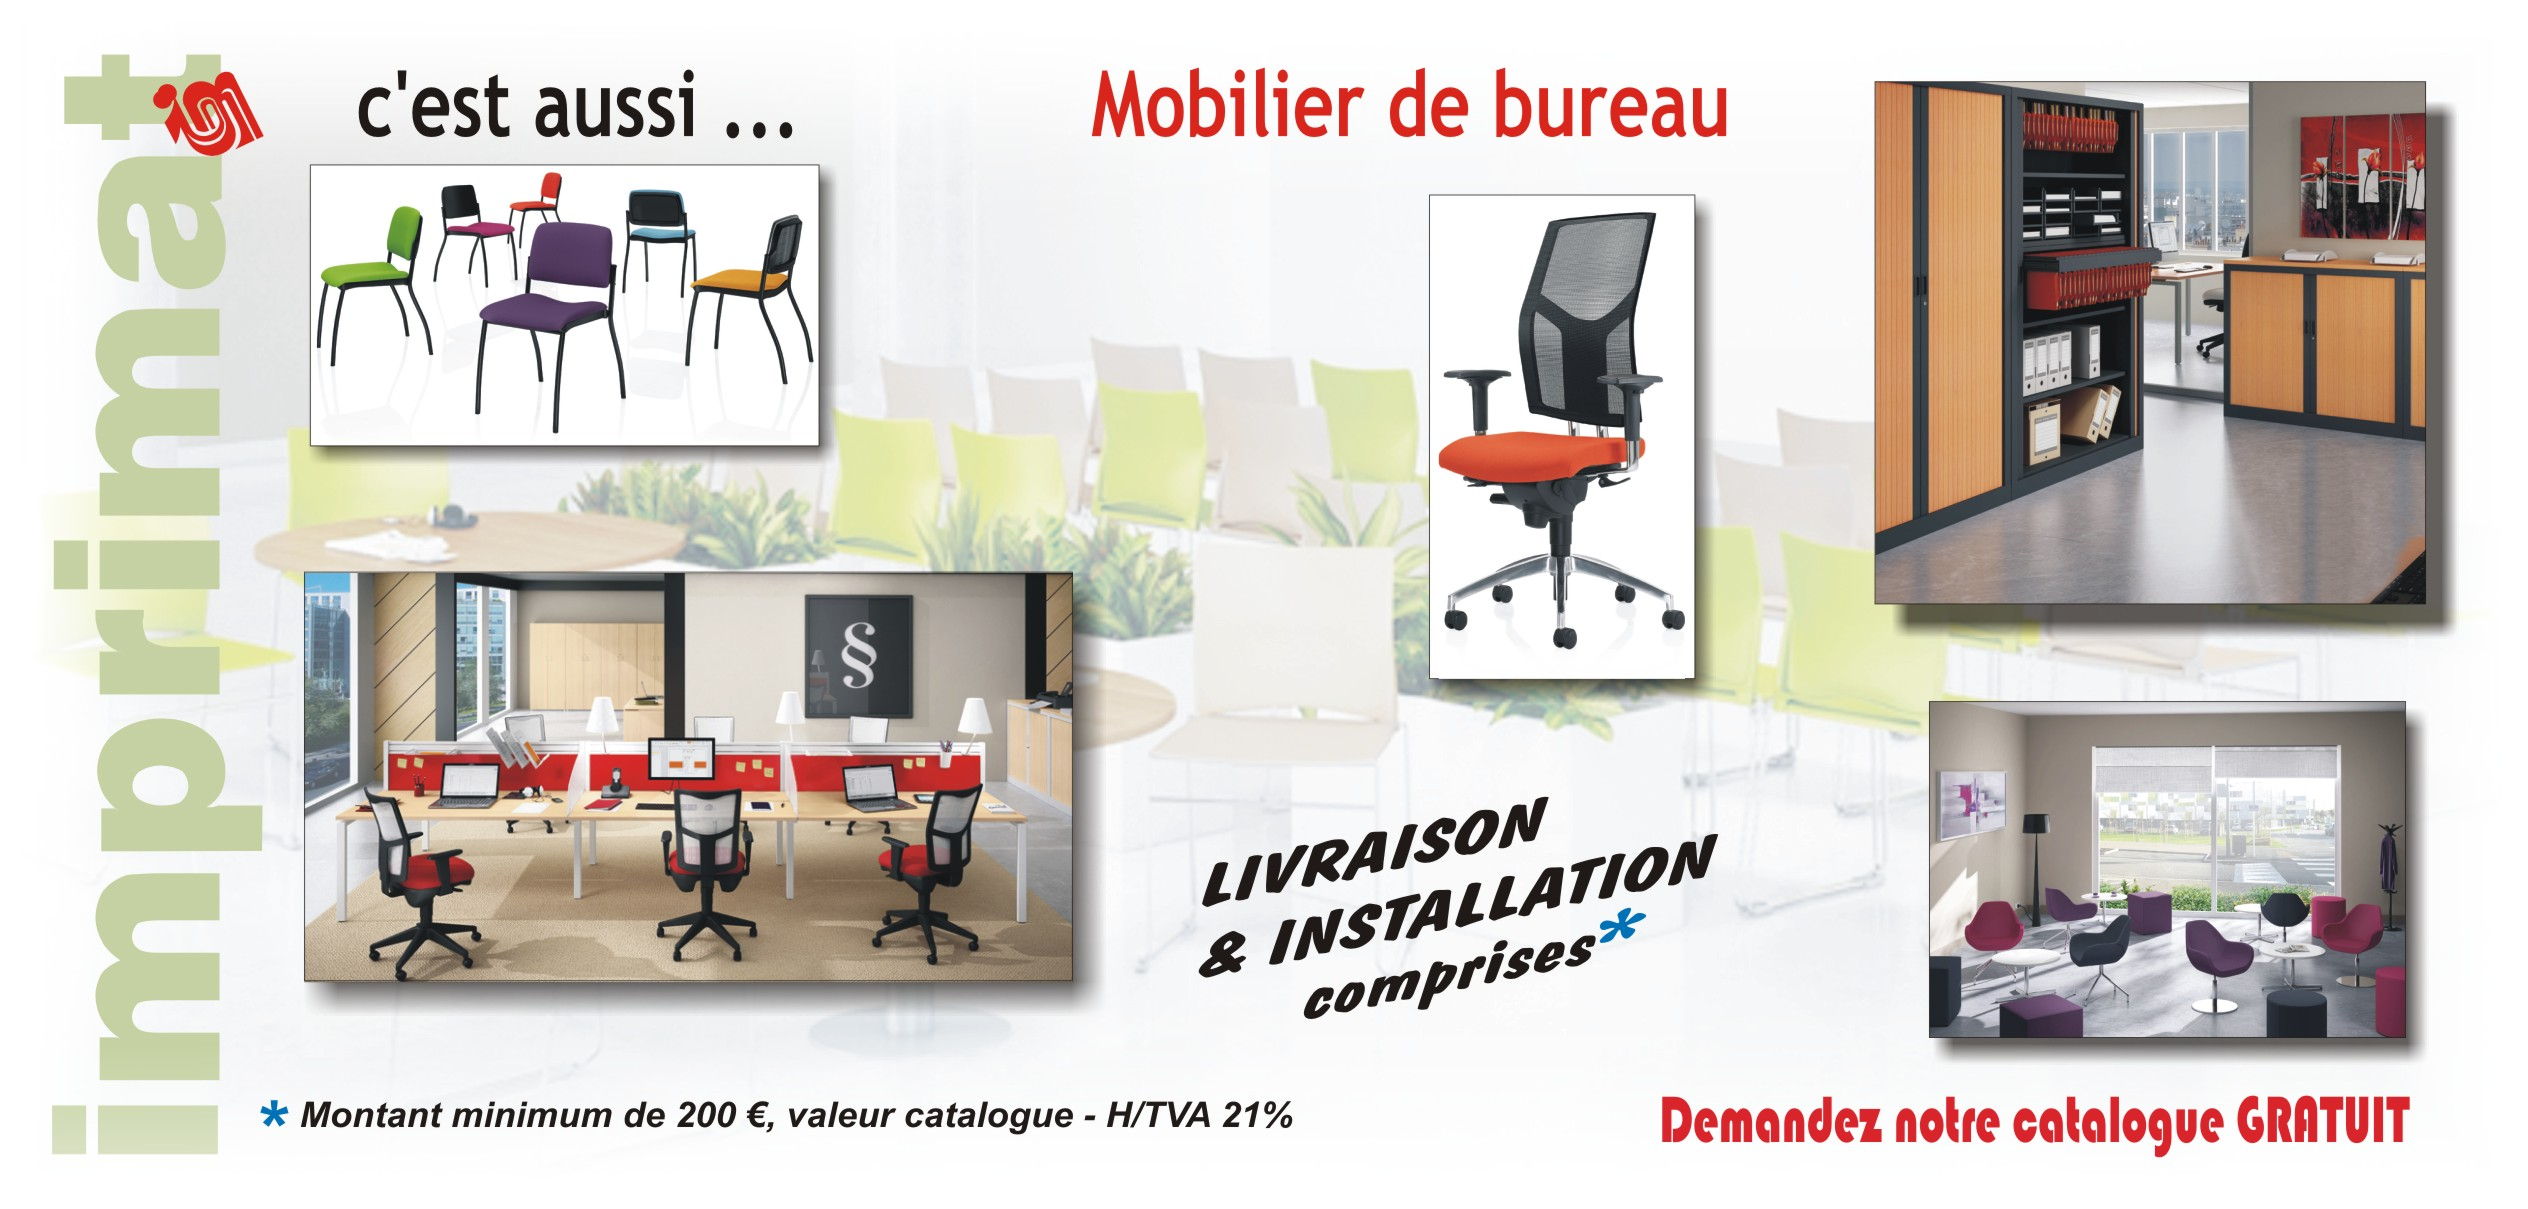 mobilier de bureau imprimat sprl. Black Bedroom Furniture Sets. Home Design Ideas